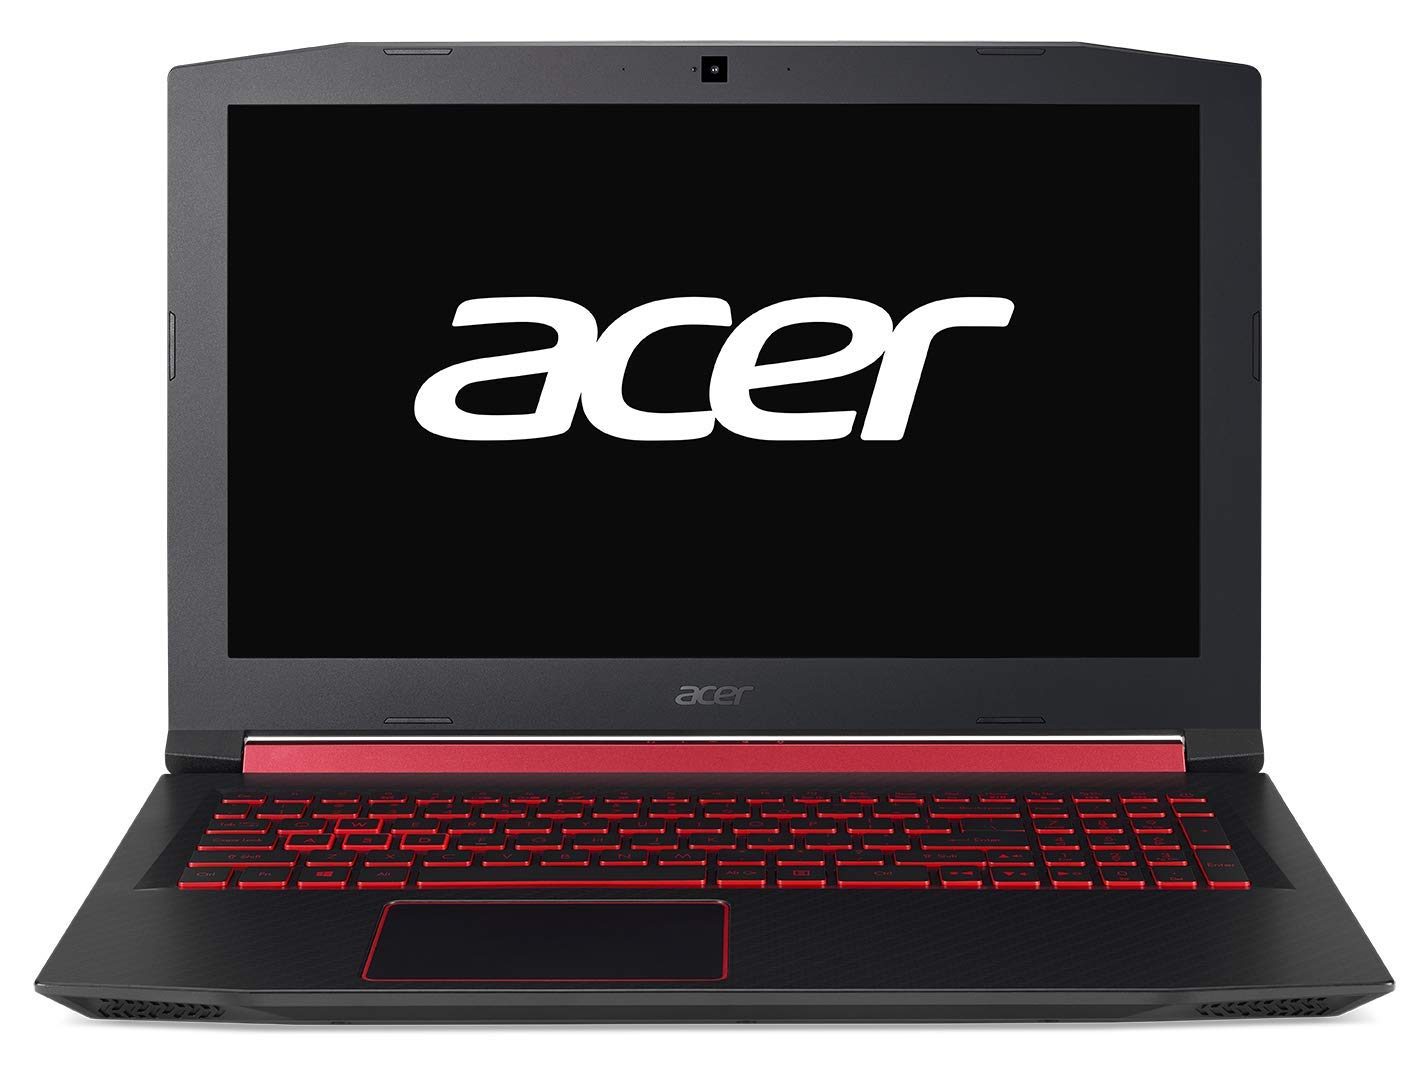 "Acer Nitro 5 | AN515-52 - Ordenador portátil Gaming de 15.6"" FHD (Intel Core i7-8750H, 8 GB RAM, 1 TB HDD, 128 GB SSD, Nvidia GeForce GTX 1050 4GB, Windows 10 Home) Negro - Teclado QWERTY Español"